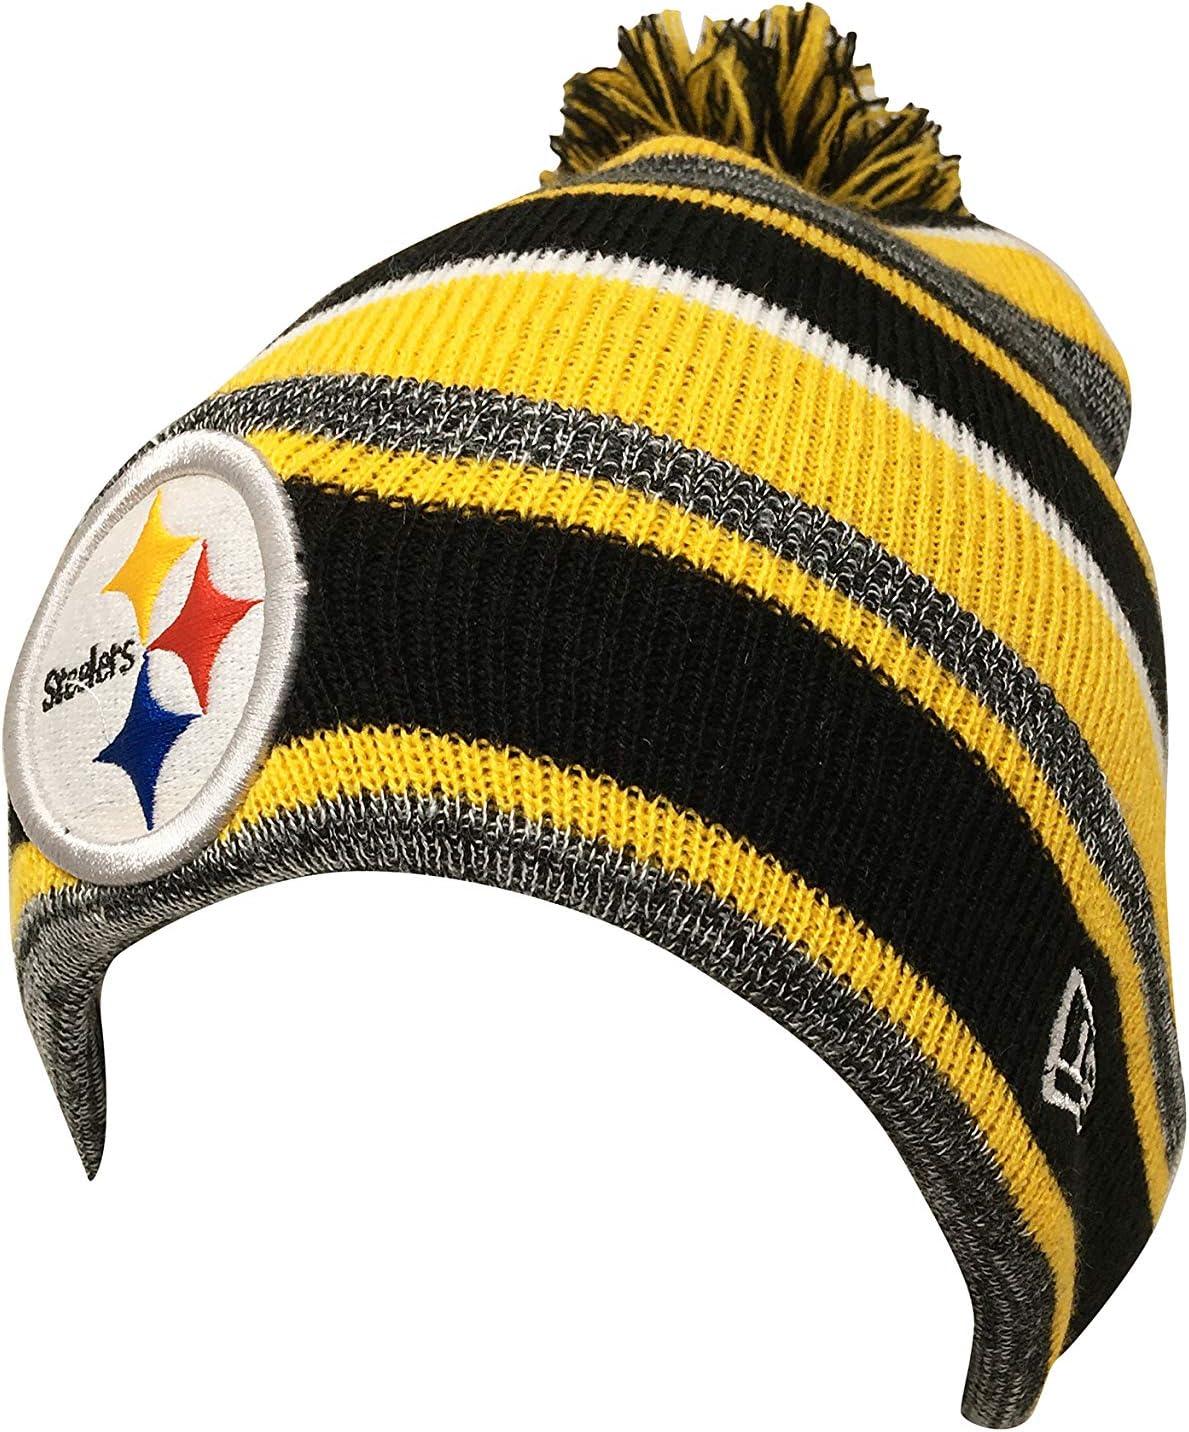 One Size New Era Pittsburgh Steelers Snow Caps Beanie Marled Stripe 21244796 Yellow//Black